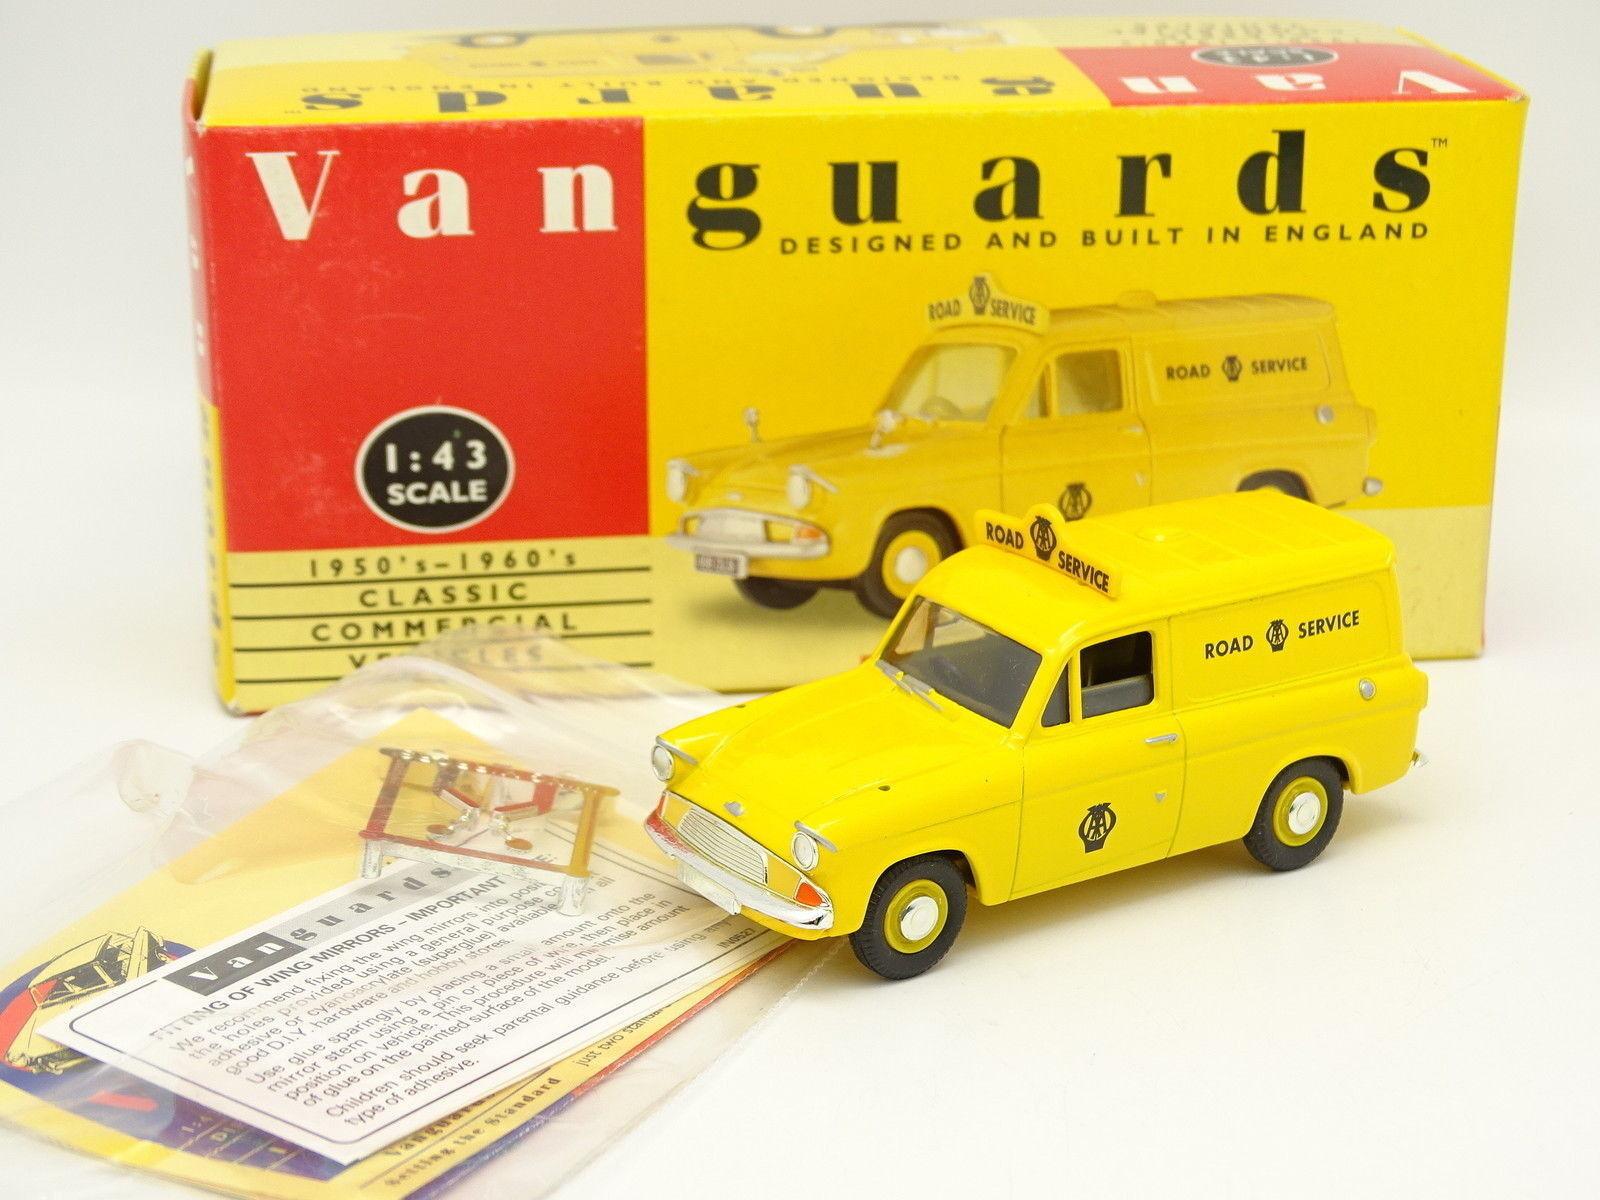 Avanguardie 1 43 - Ford Anglia Van Road Servizio